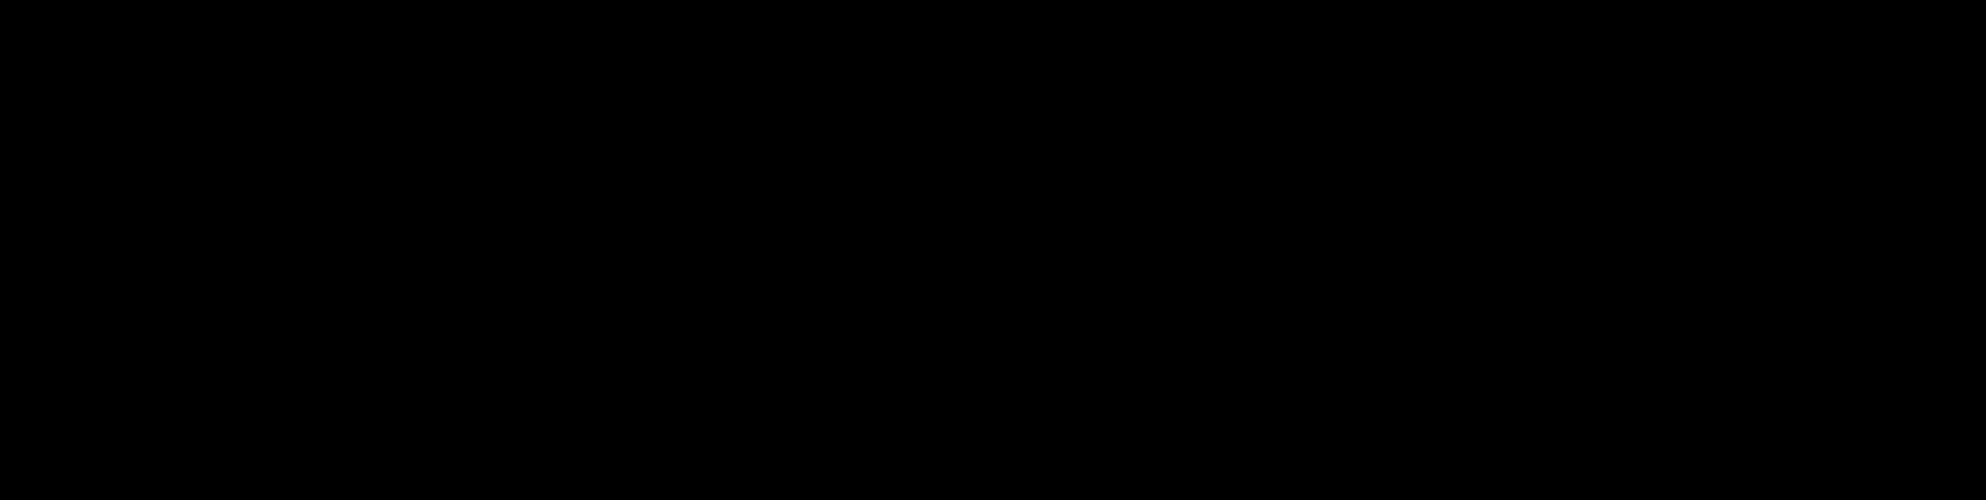 Darwin V7 logo